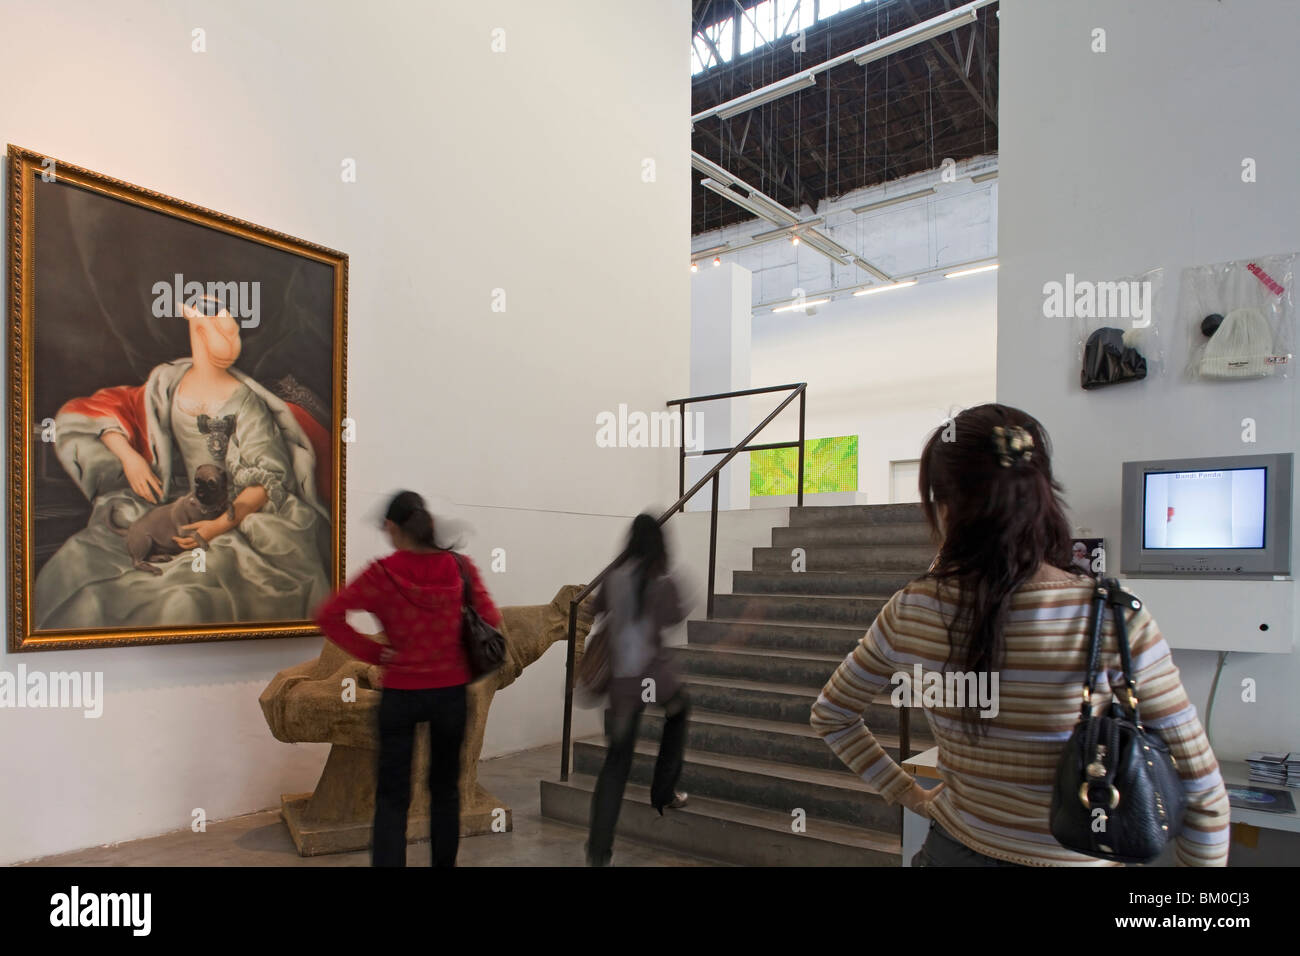 Les gens à ShanghART art gallery, Wensan Road, Shanghai, China, Asia Photo Stock